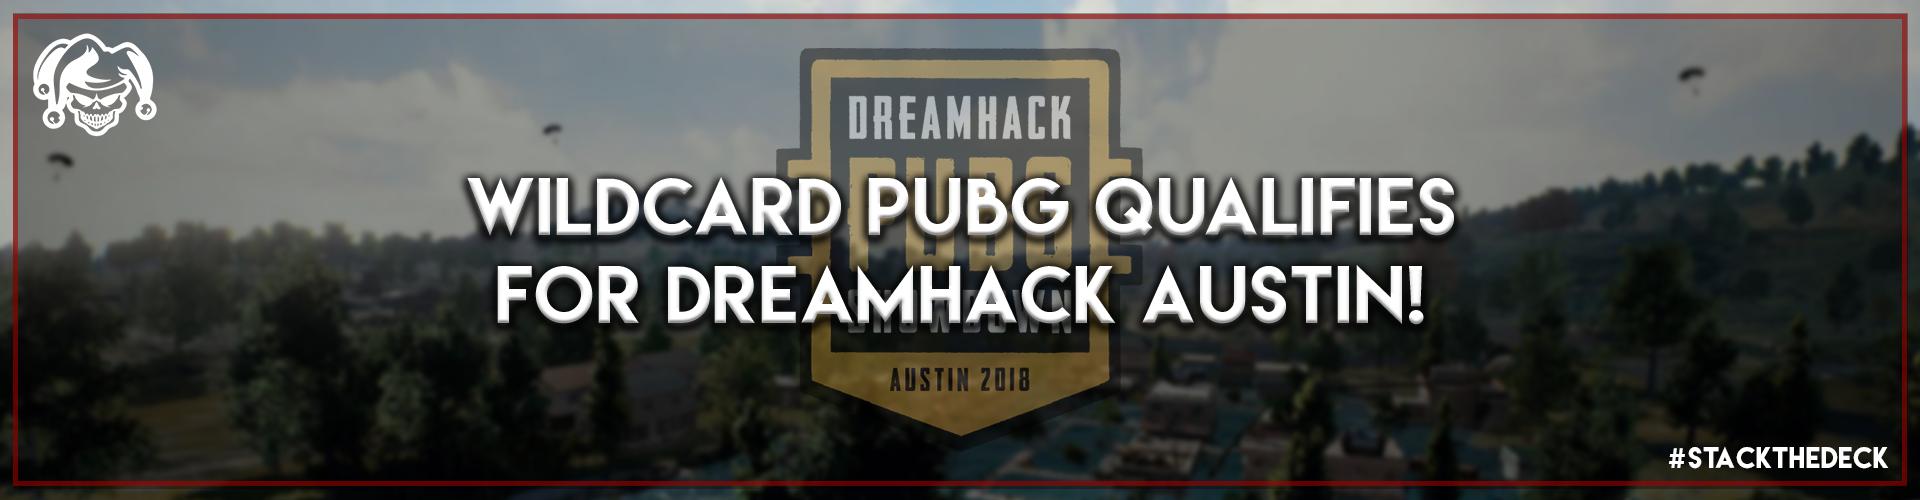 Wildcard PUBG Qualifies for Dreamhack Austin!